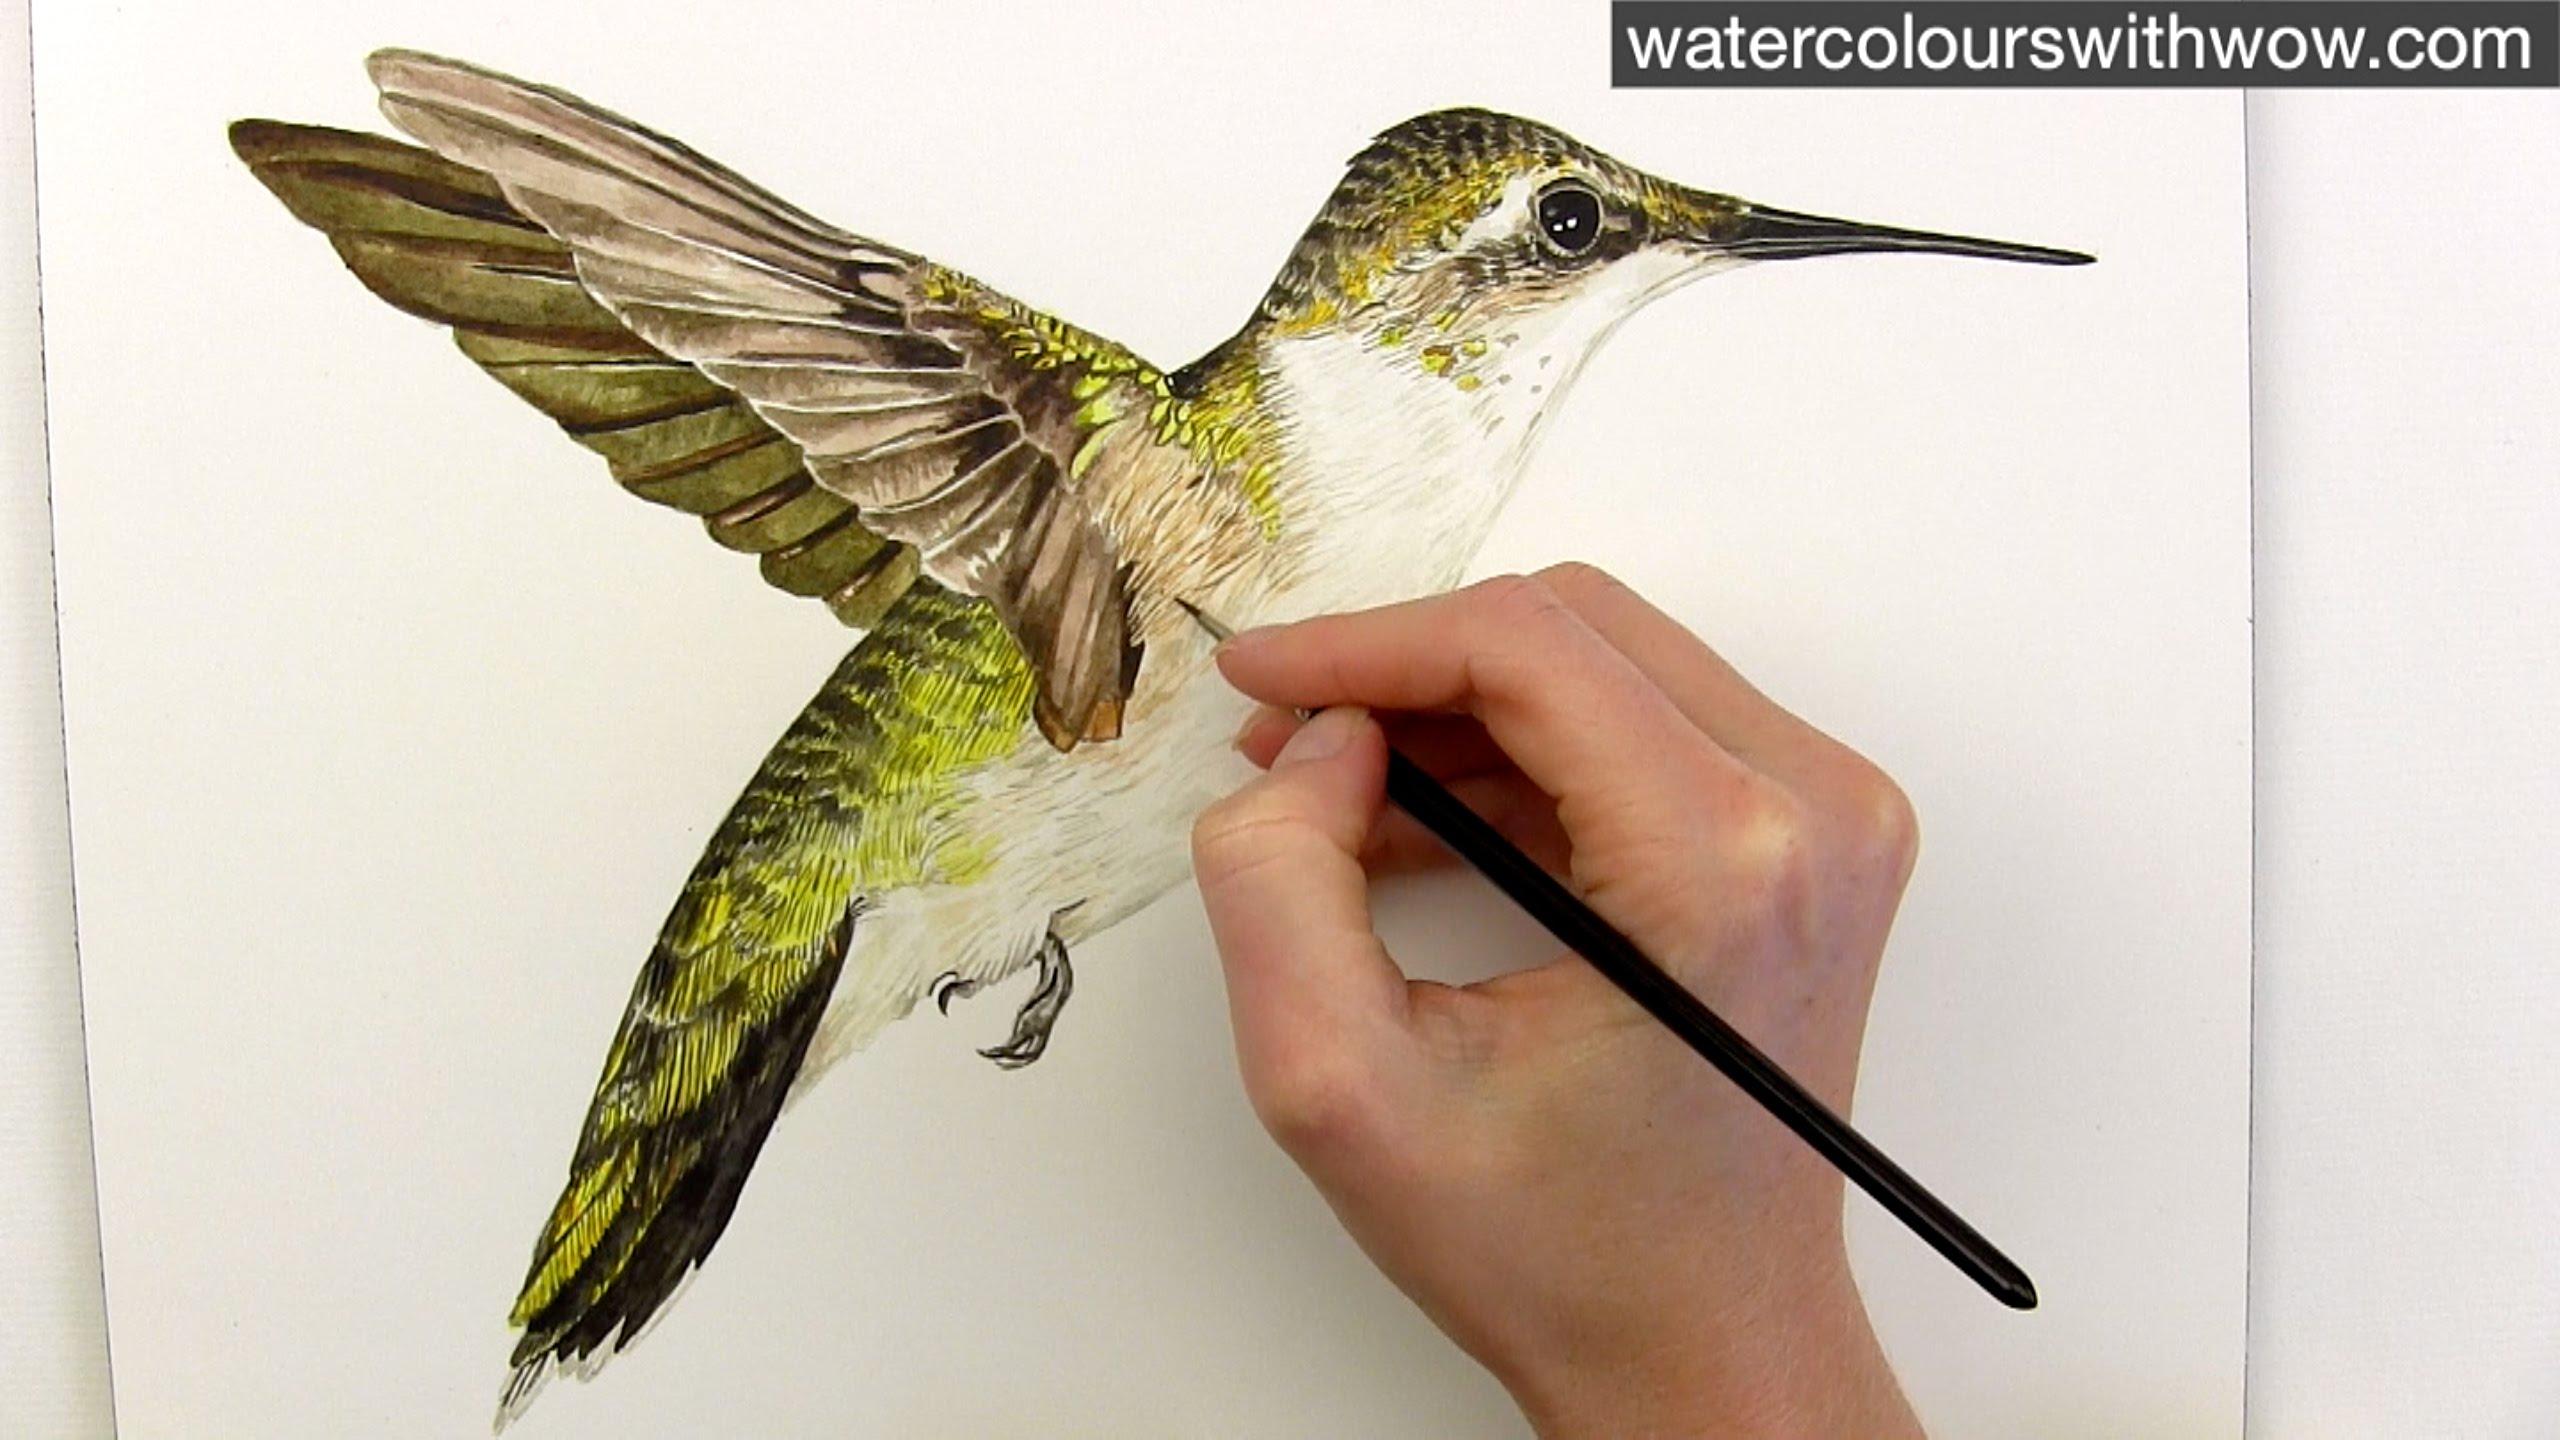 Drawn hummingbird anna's hummingbird YouTube in in hummingbird paint